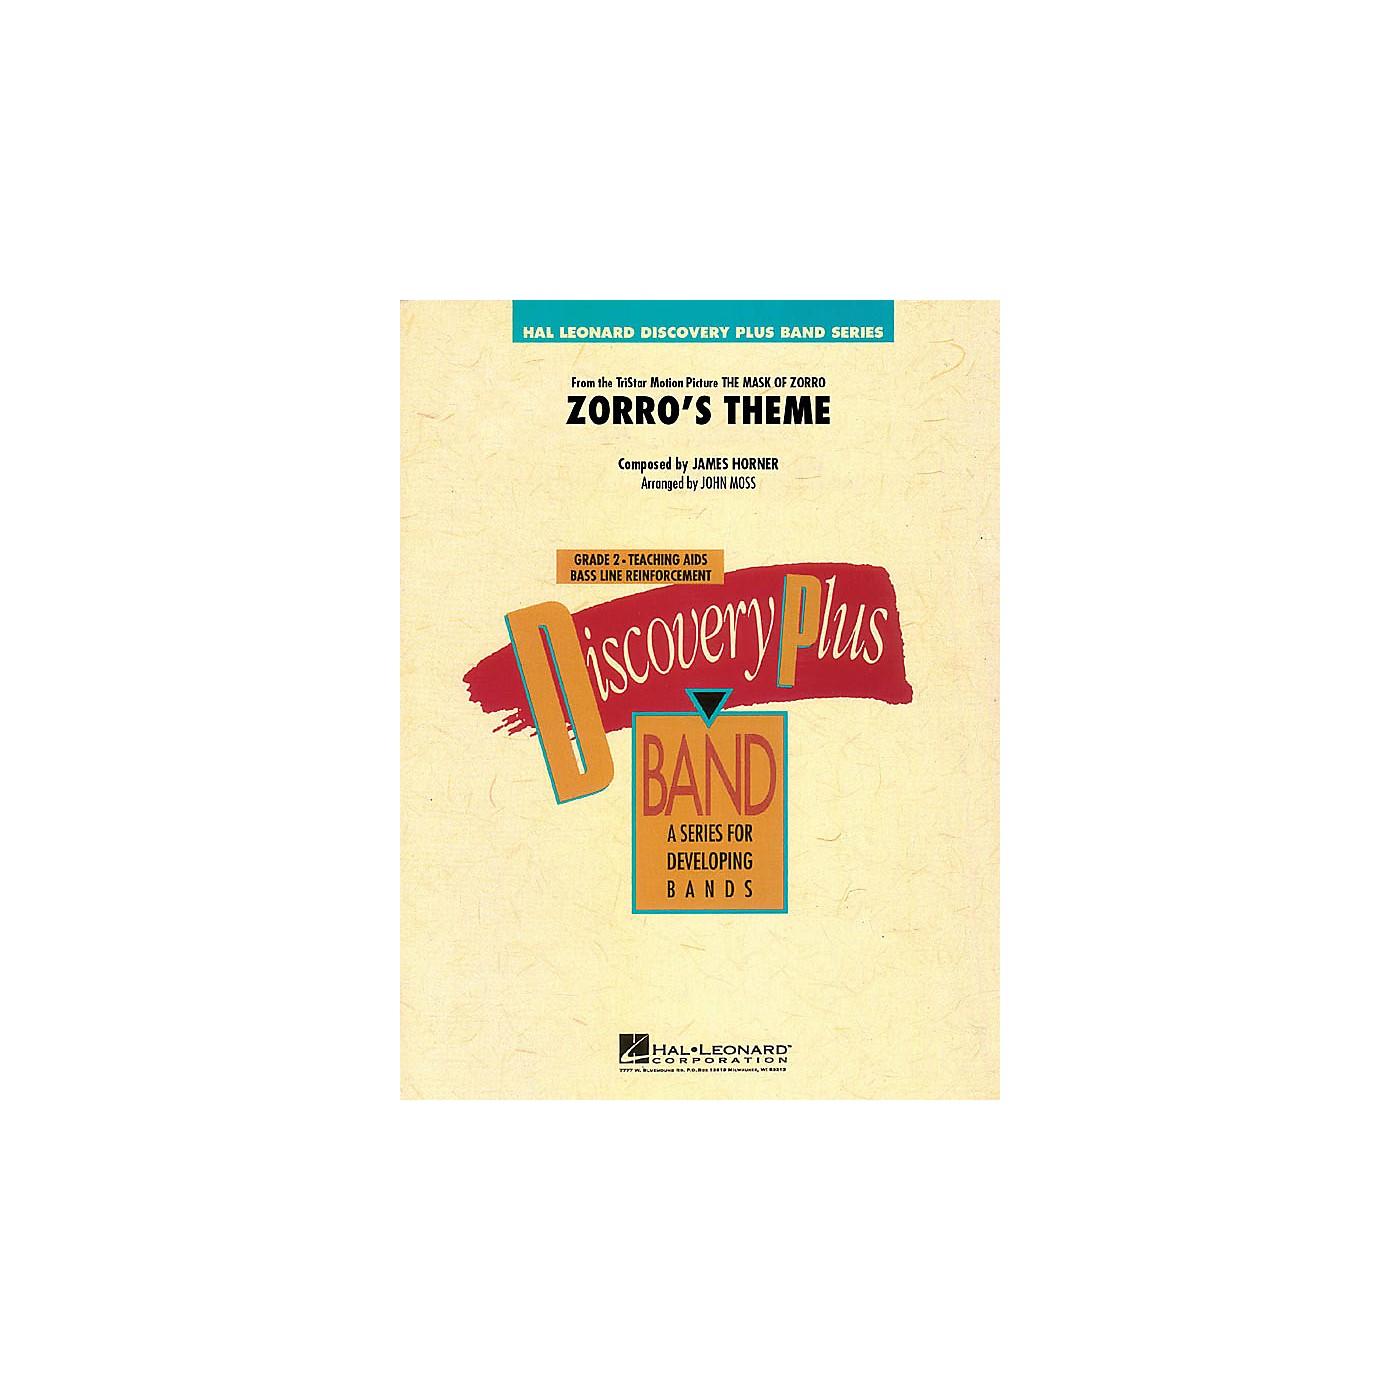 Hal Leonard Zorro's Theme - Discovery Plus Band Level 2 arranged by John Moss thumbnail